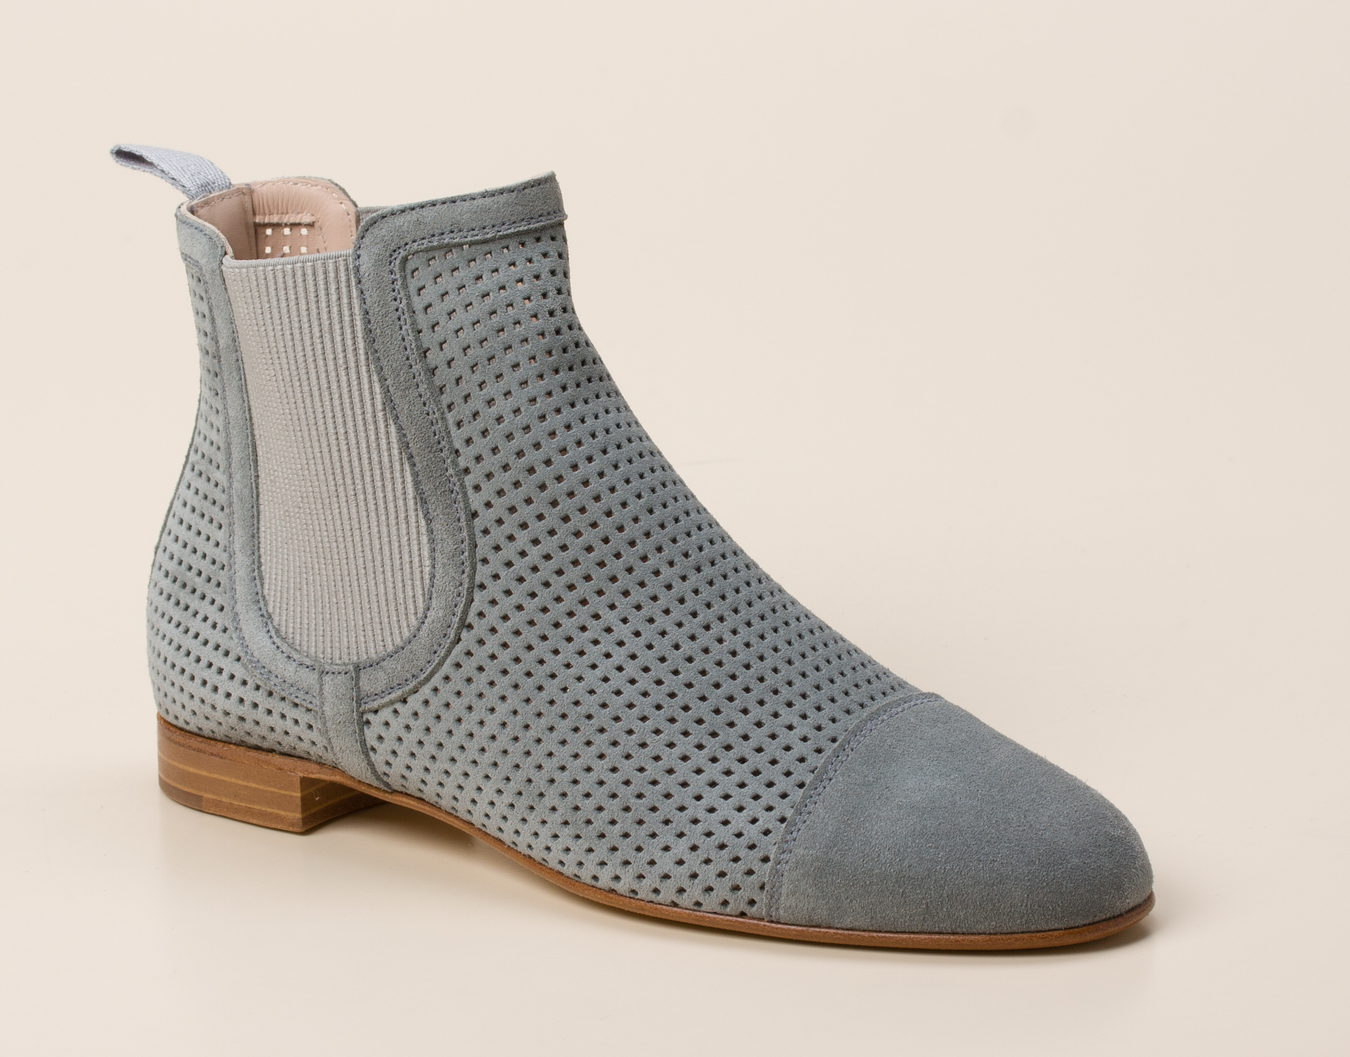 244c5b01eff4d4 Pertini Damen Chelsea-Stiefelette in grau kaufen